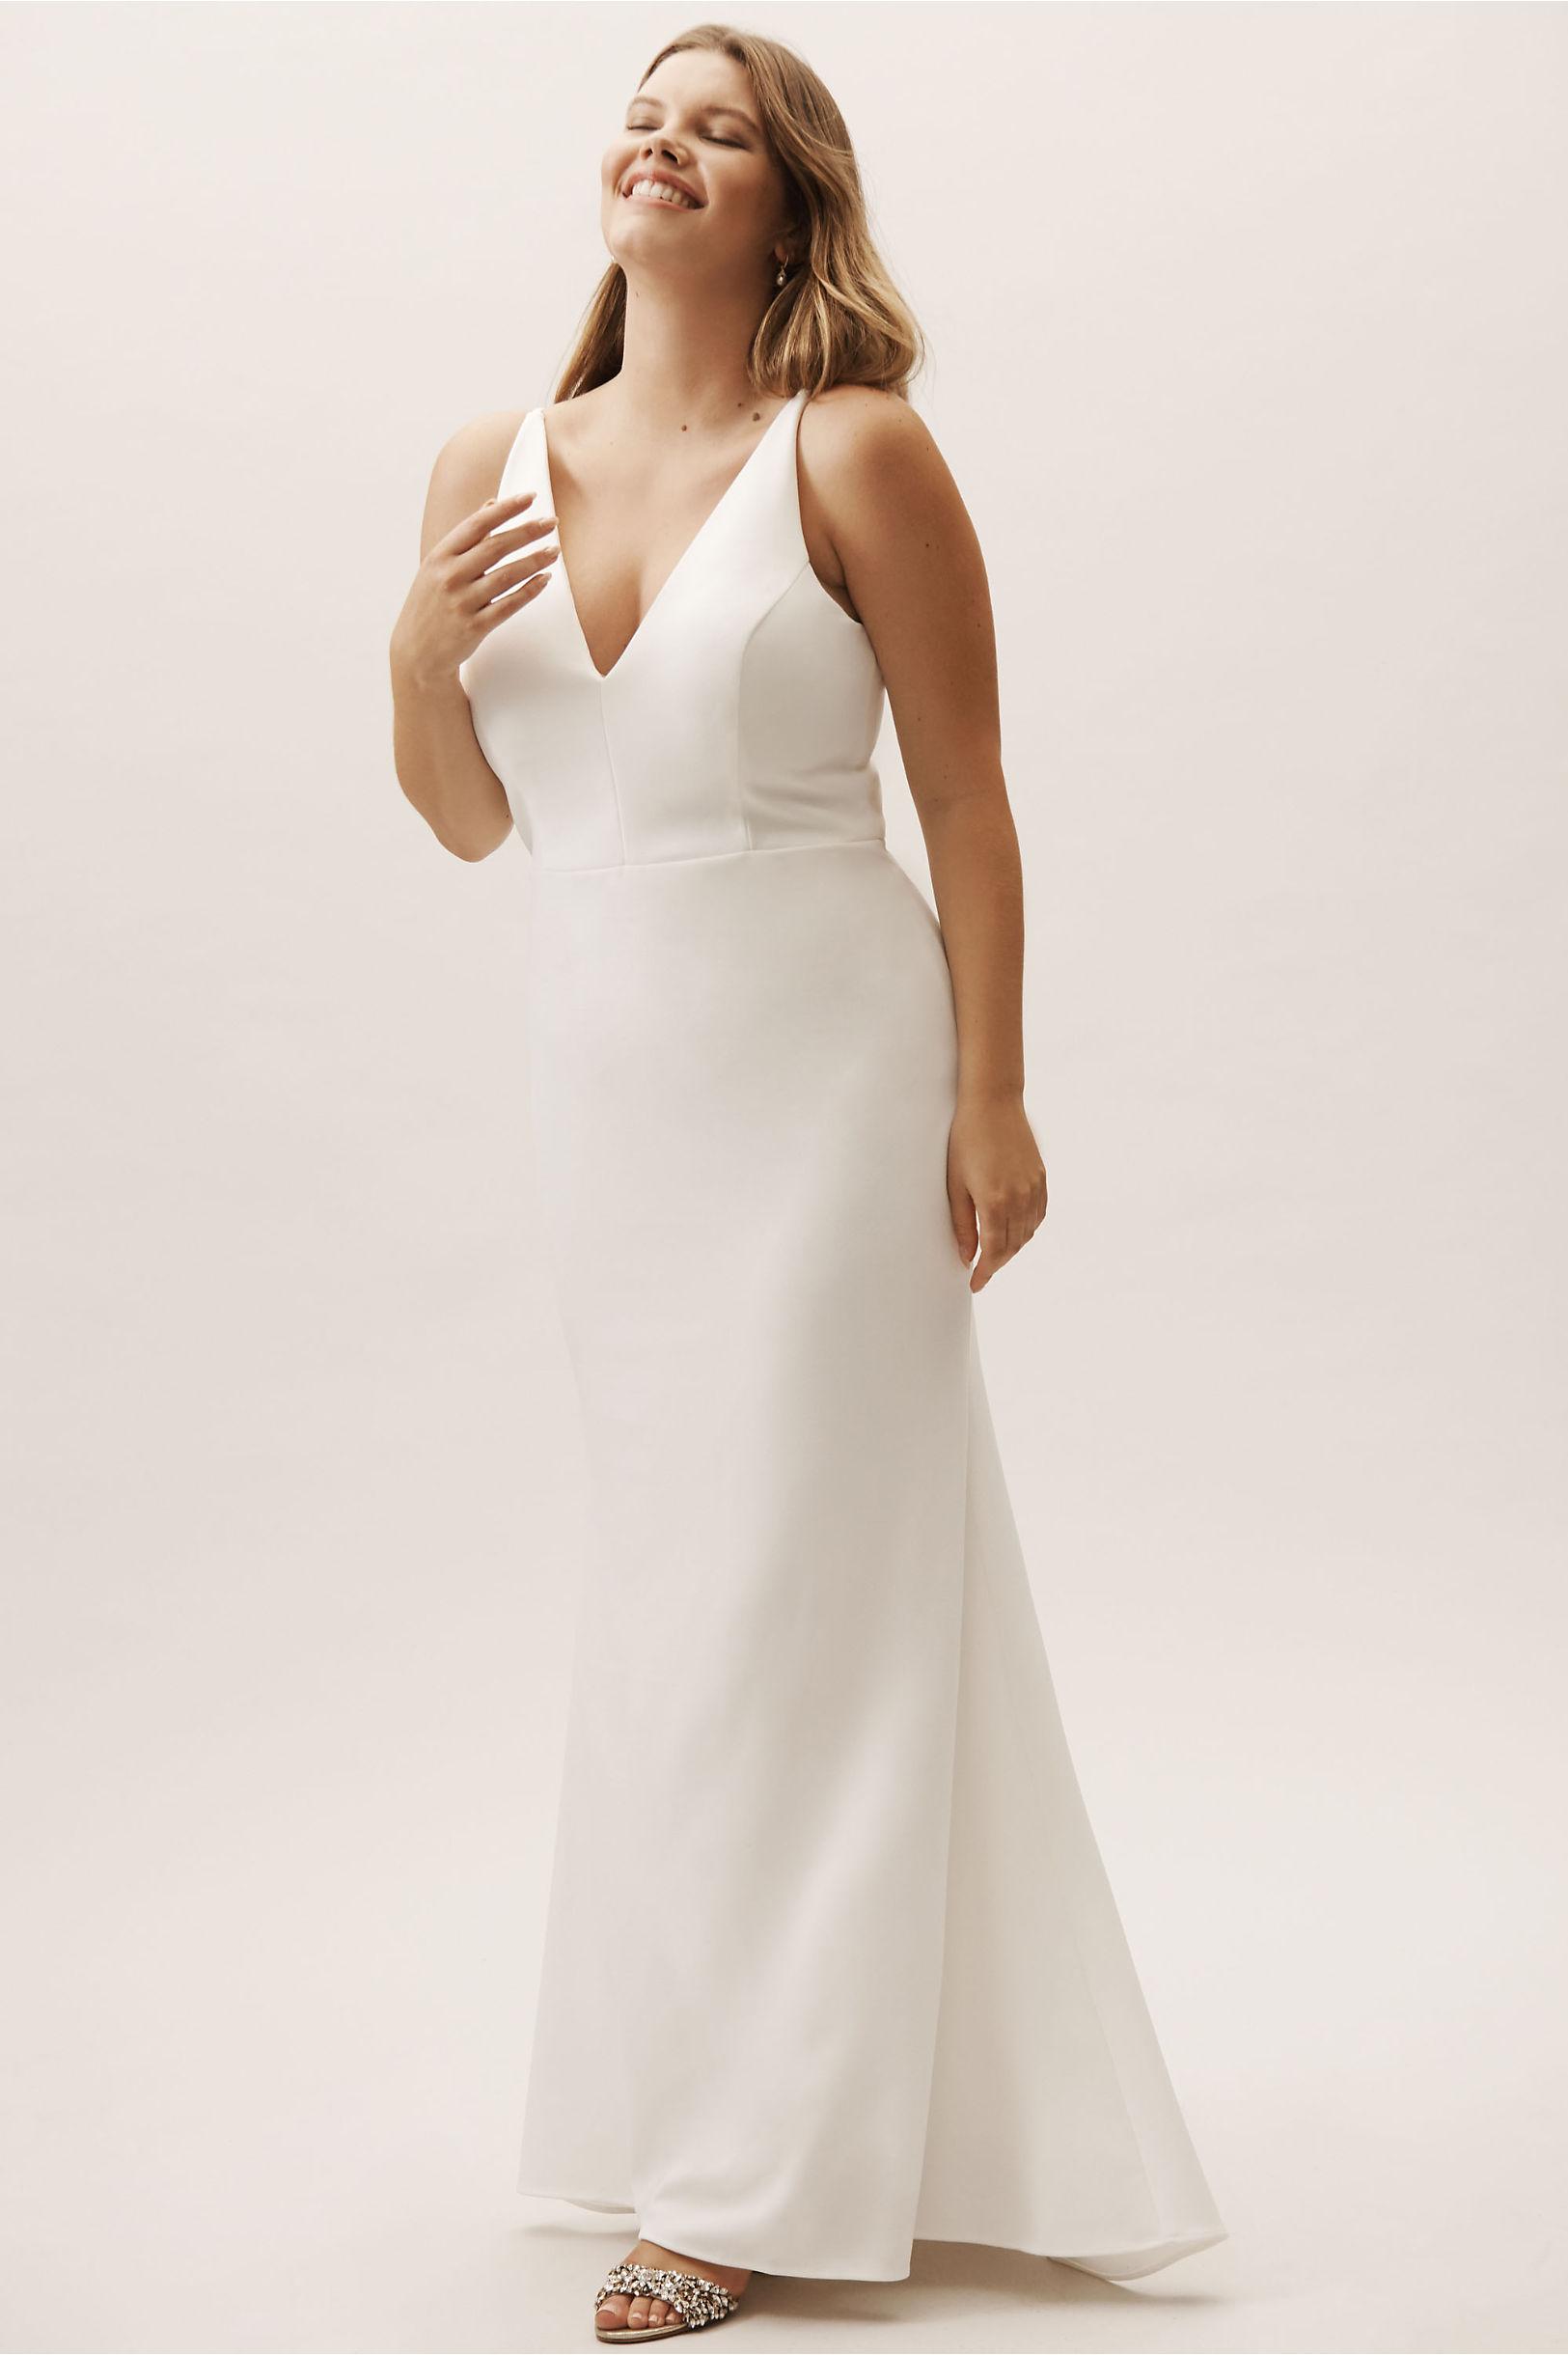 Jones Dress Ivory in Bride | BHLDN